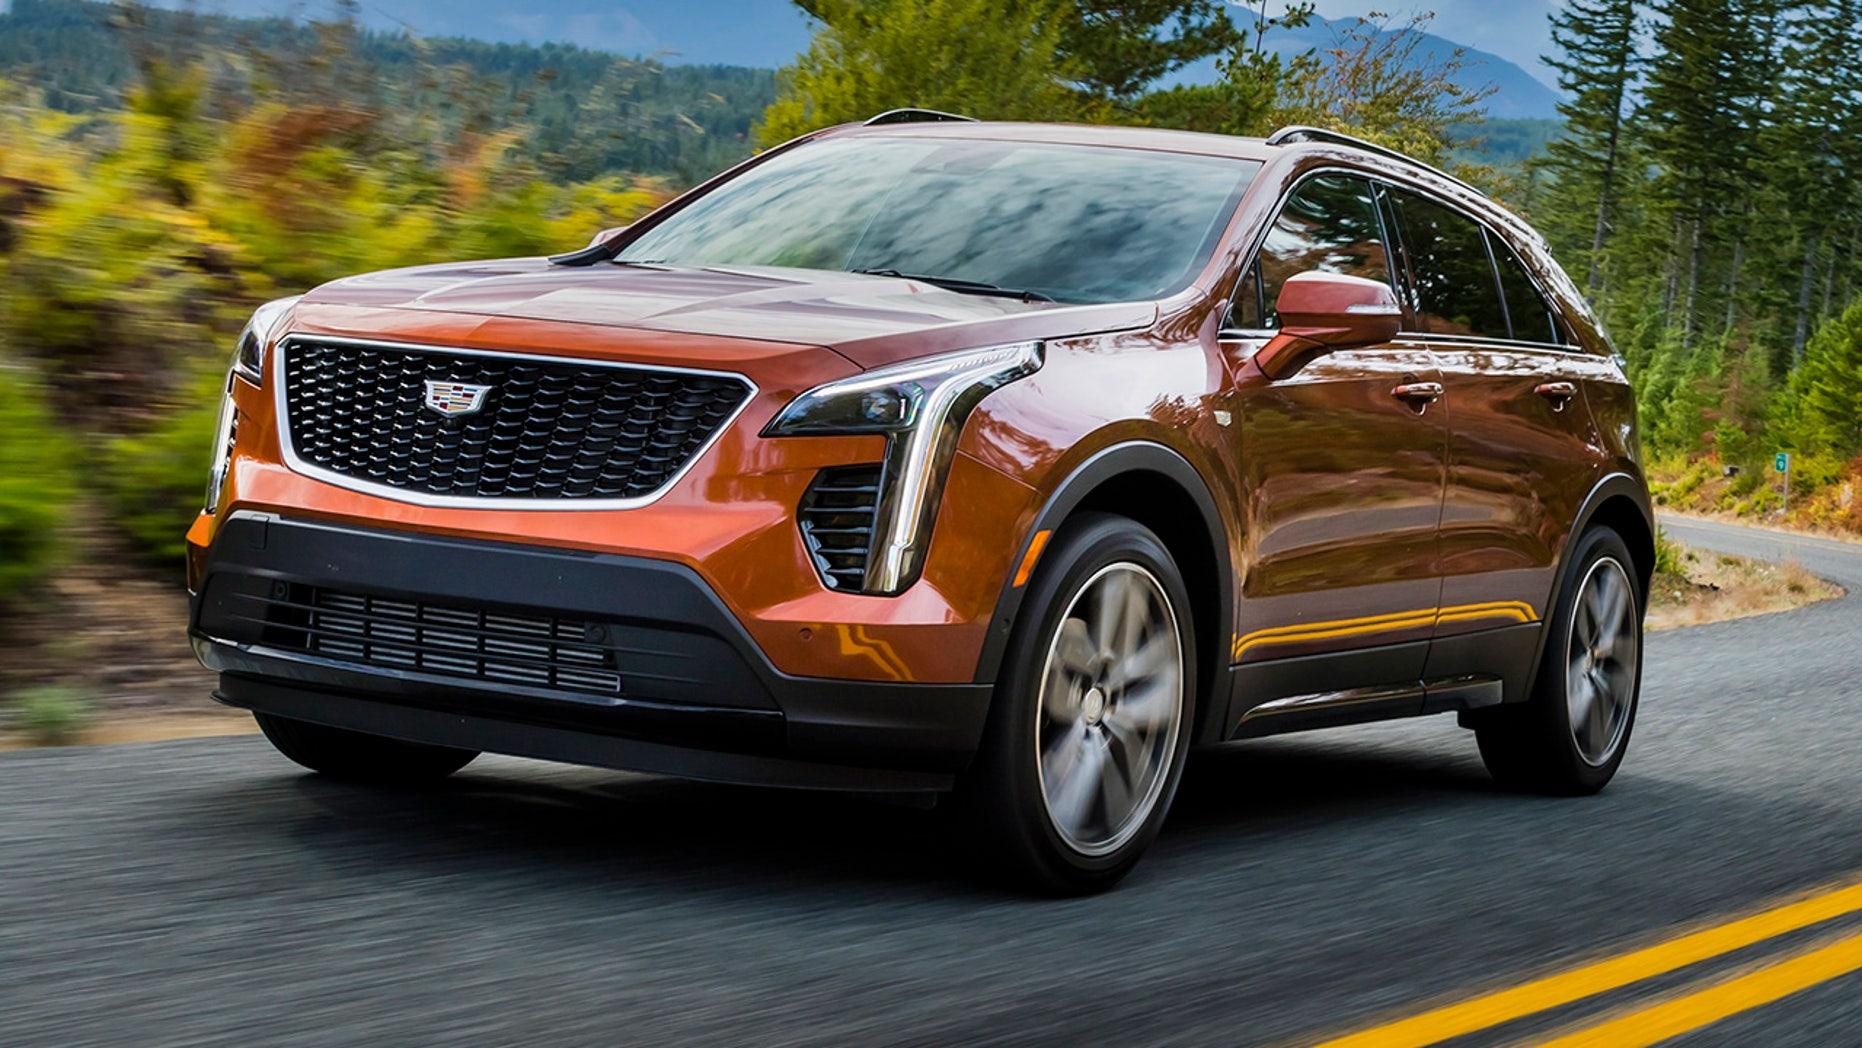 2019 Cadillac Xt4 Test Drive A Little Late Suv Fox News